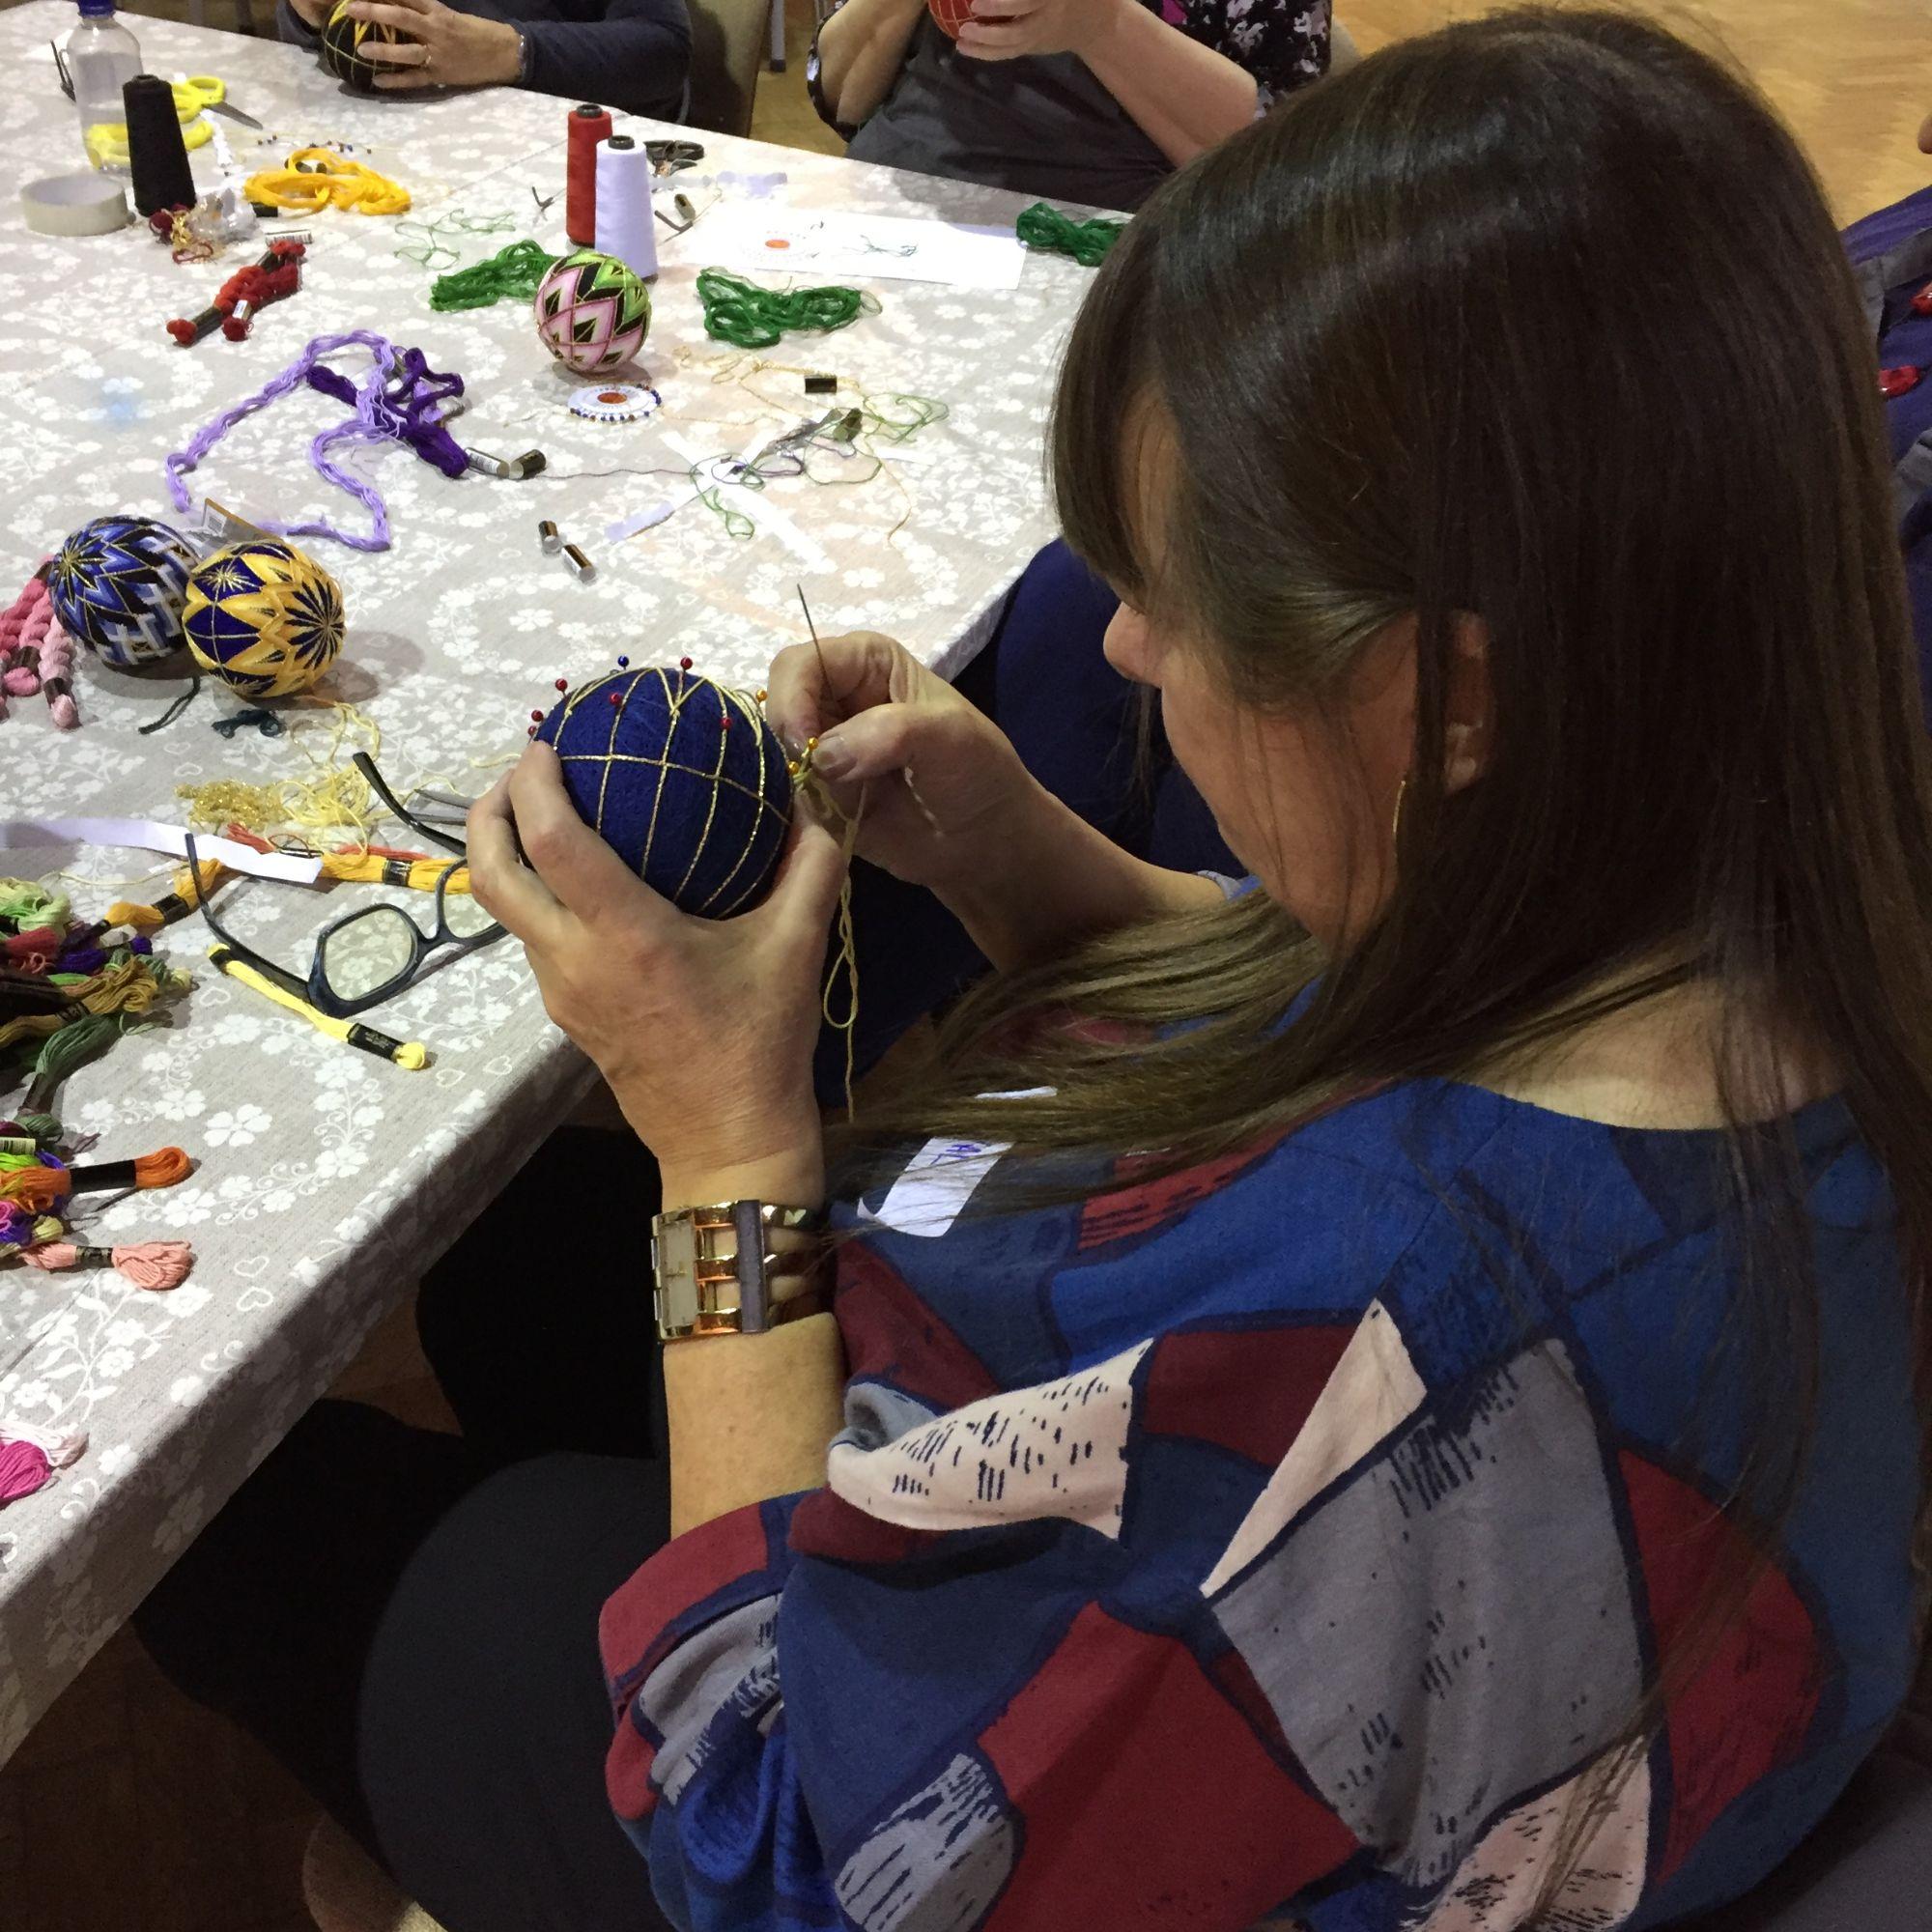 Temari Ball Making Workshop  - Stitching